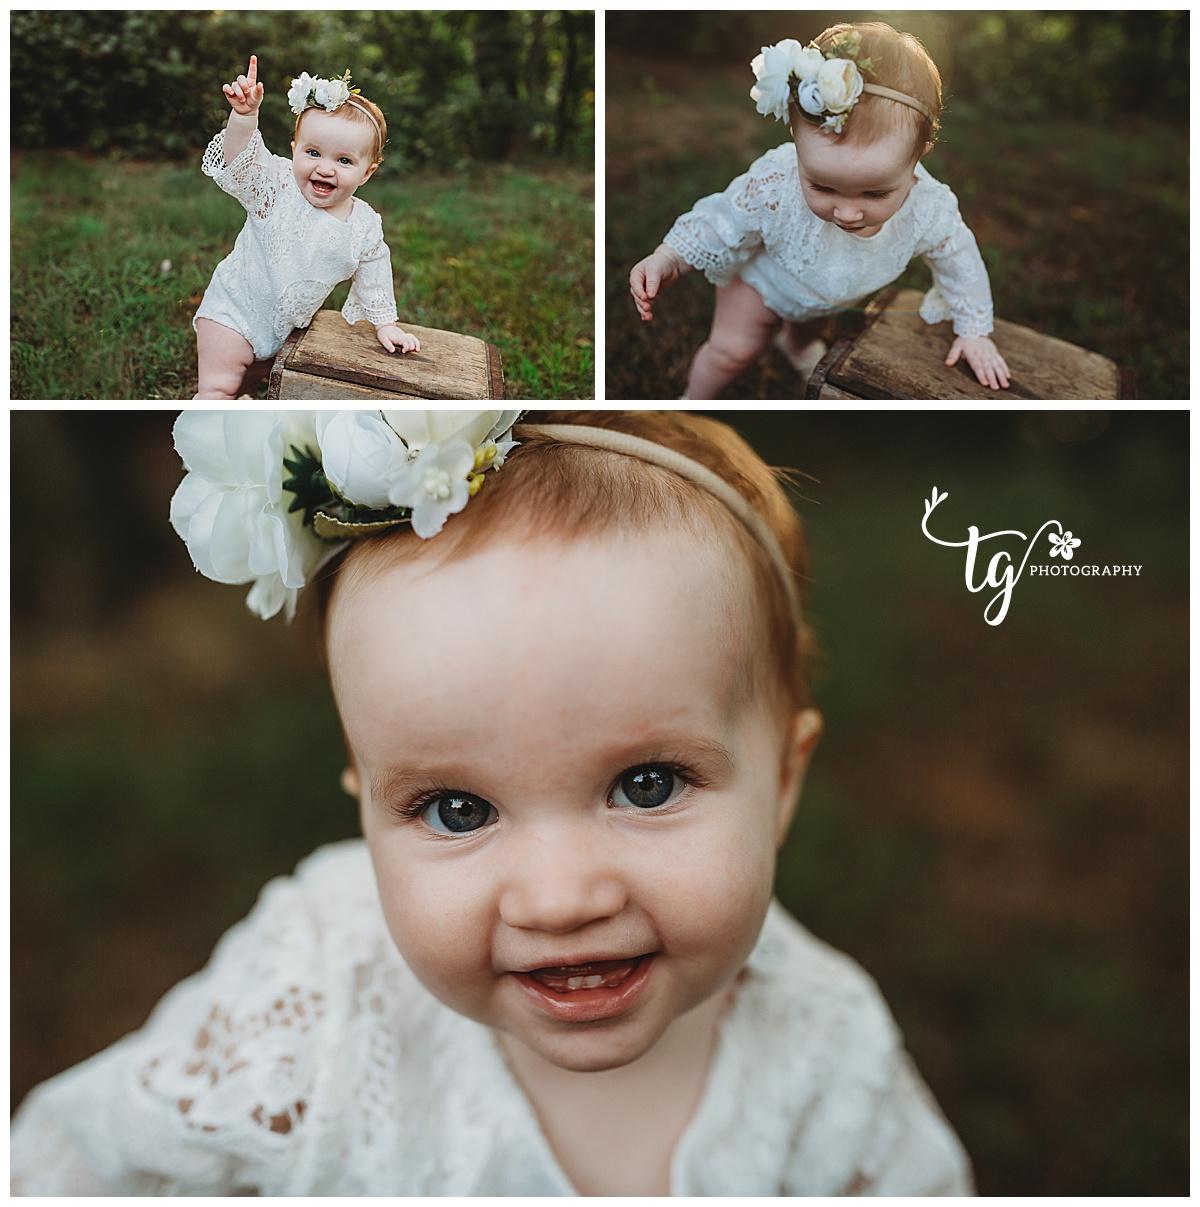 photographer for first birthday photos